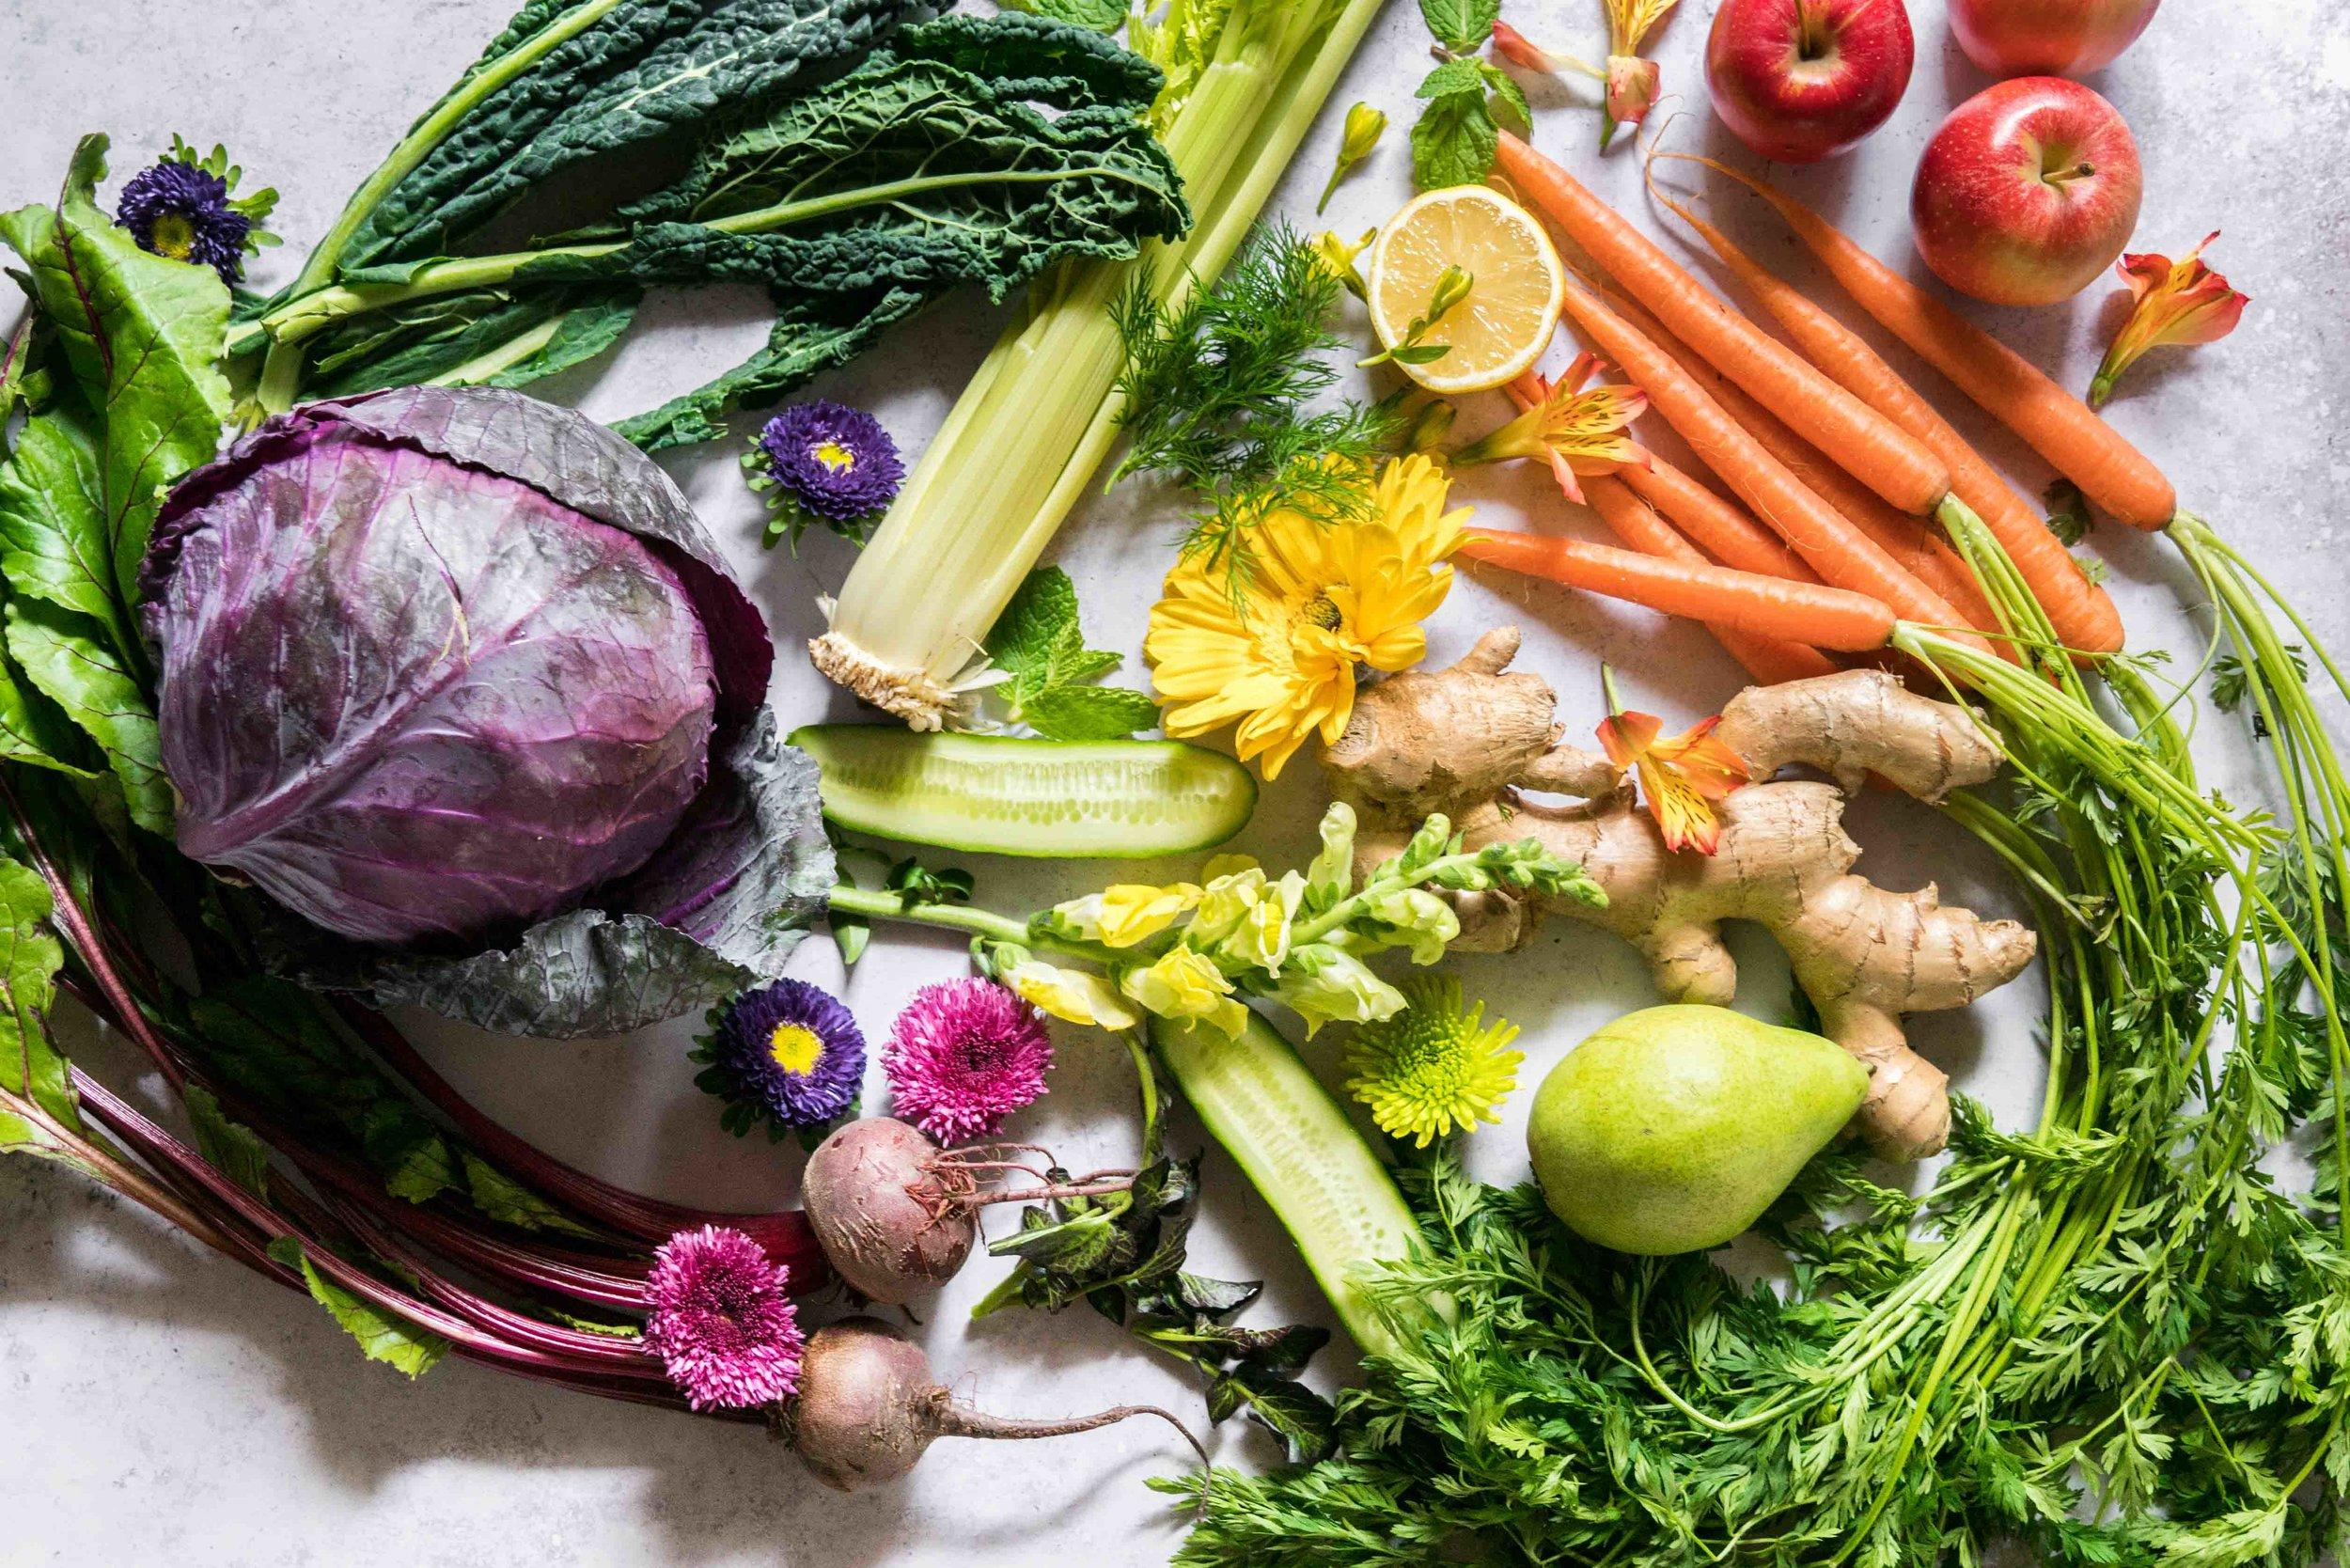 zero waste juicing recipes- rainbow produce and flowers